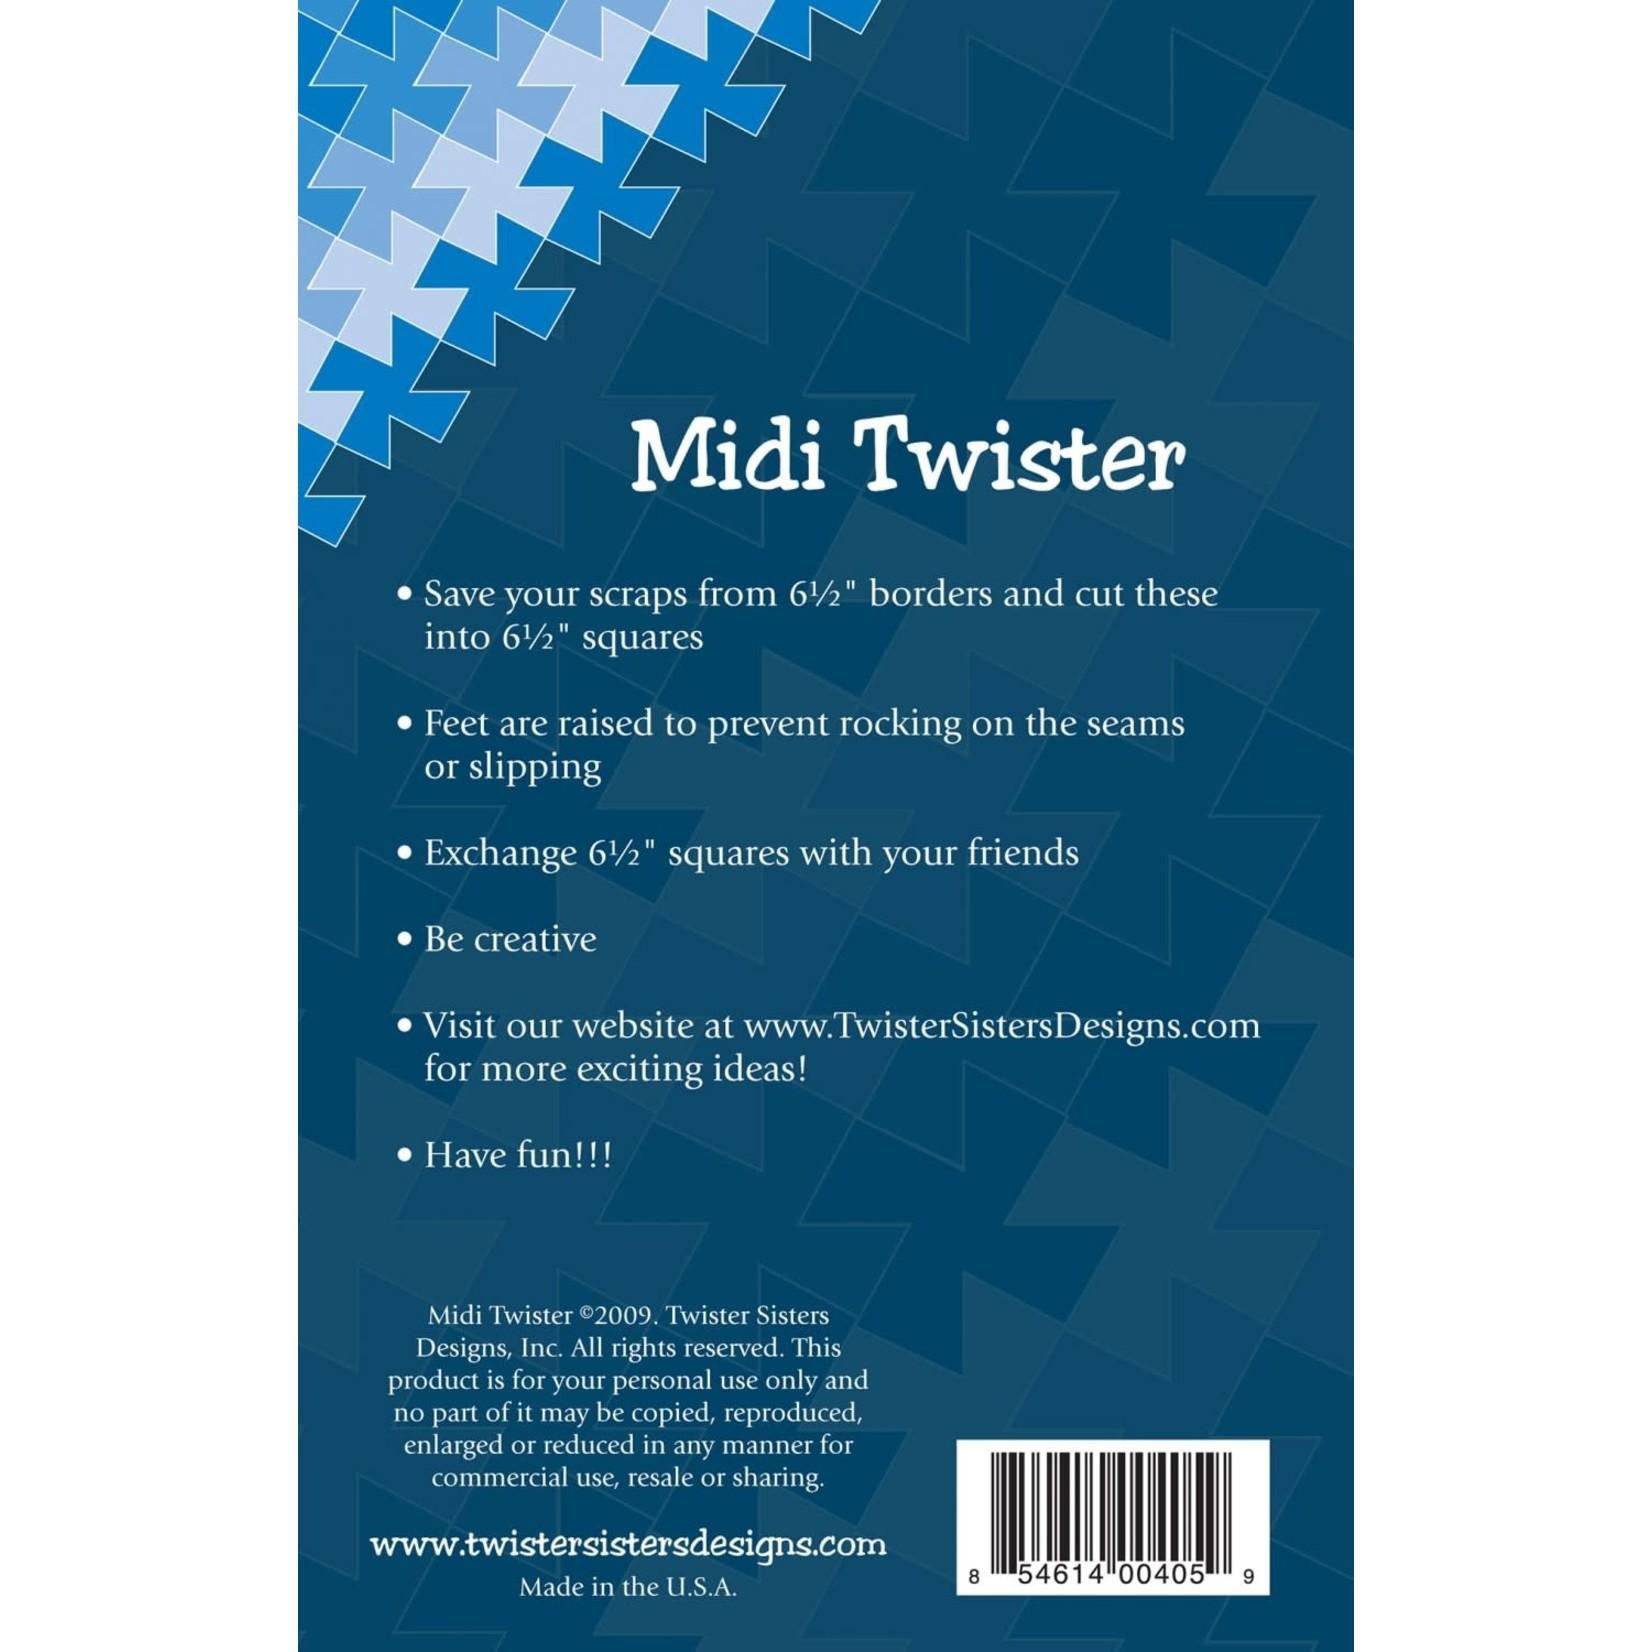 Twister Sisters Midi Twister Pinwheel Template